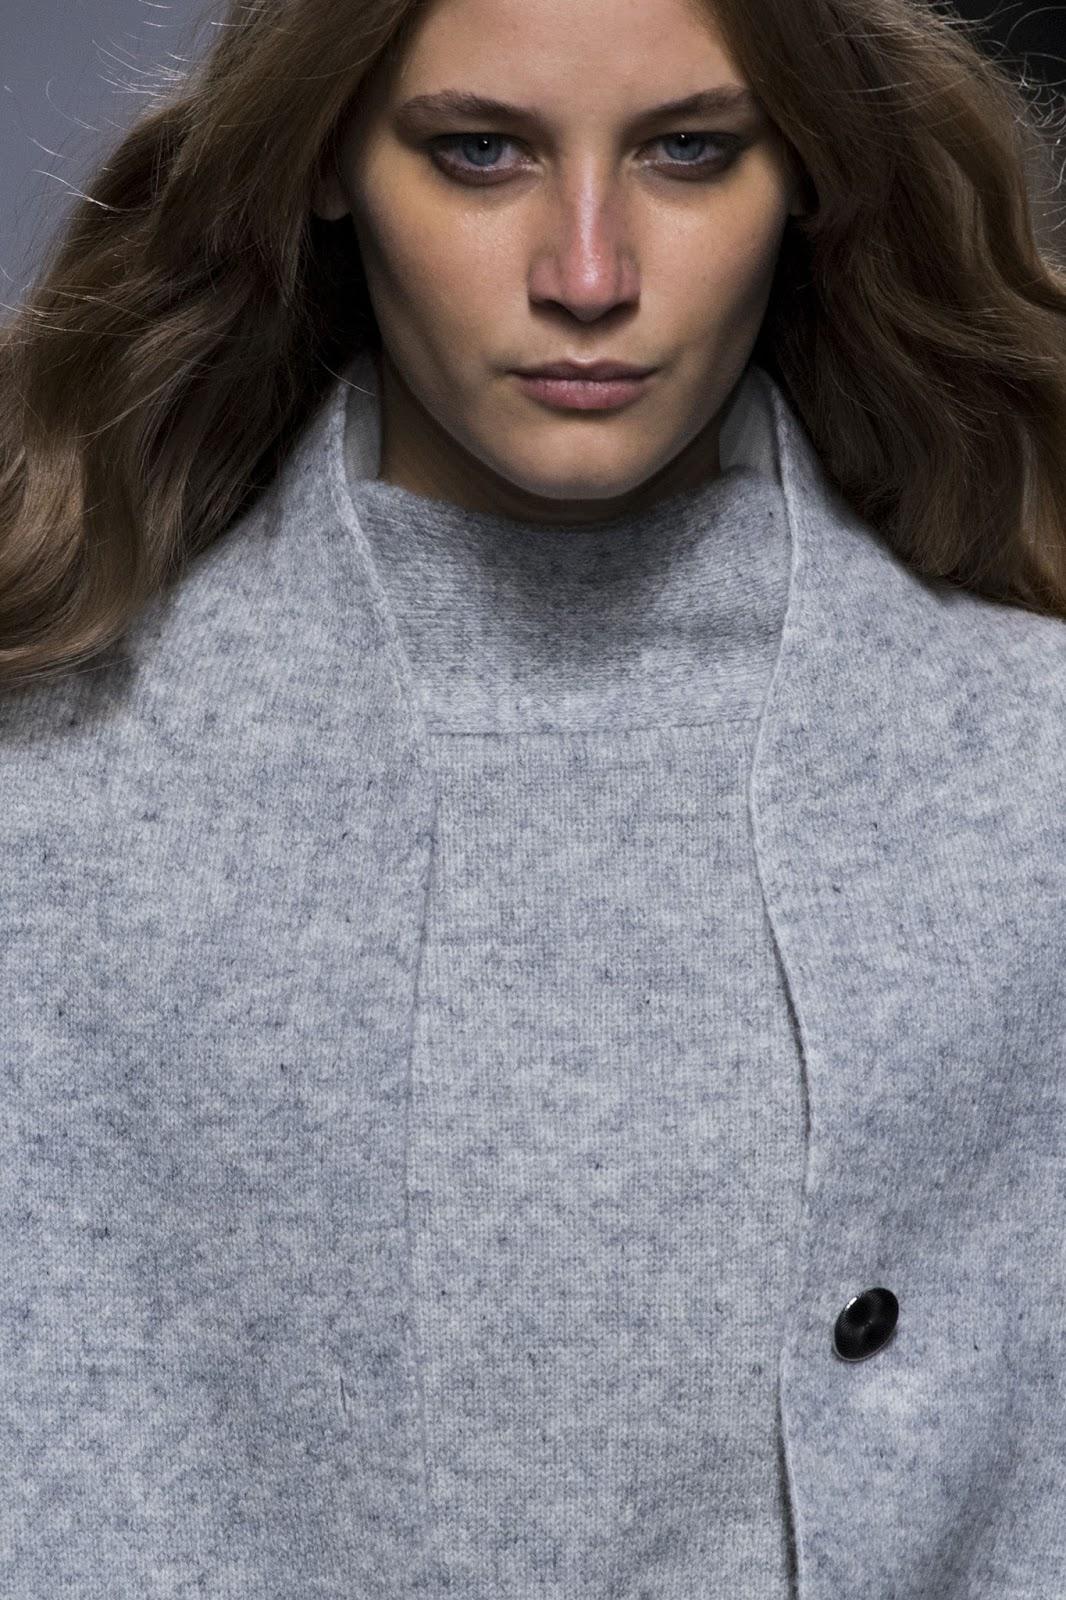 Melina Gesto at Paris fashion week / Review, runway looks and details of Hermes Fall/Winter 2016 collection from Paris fashion week via www.fashionedbylove.co.uk British fashion blog